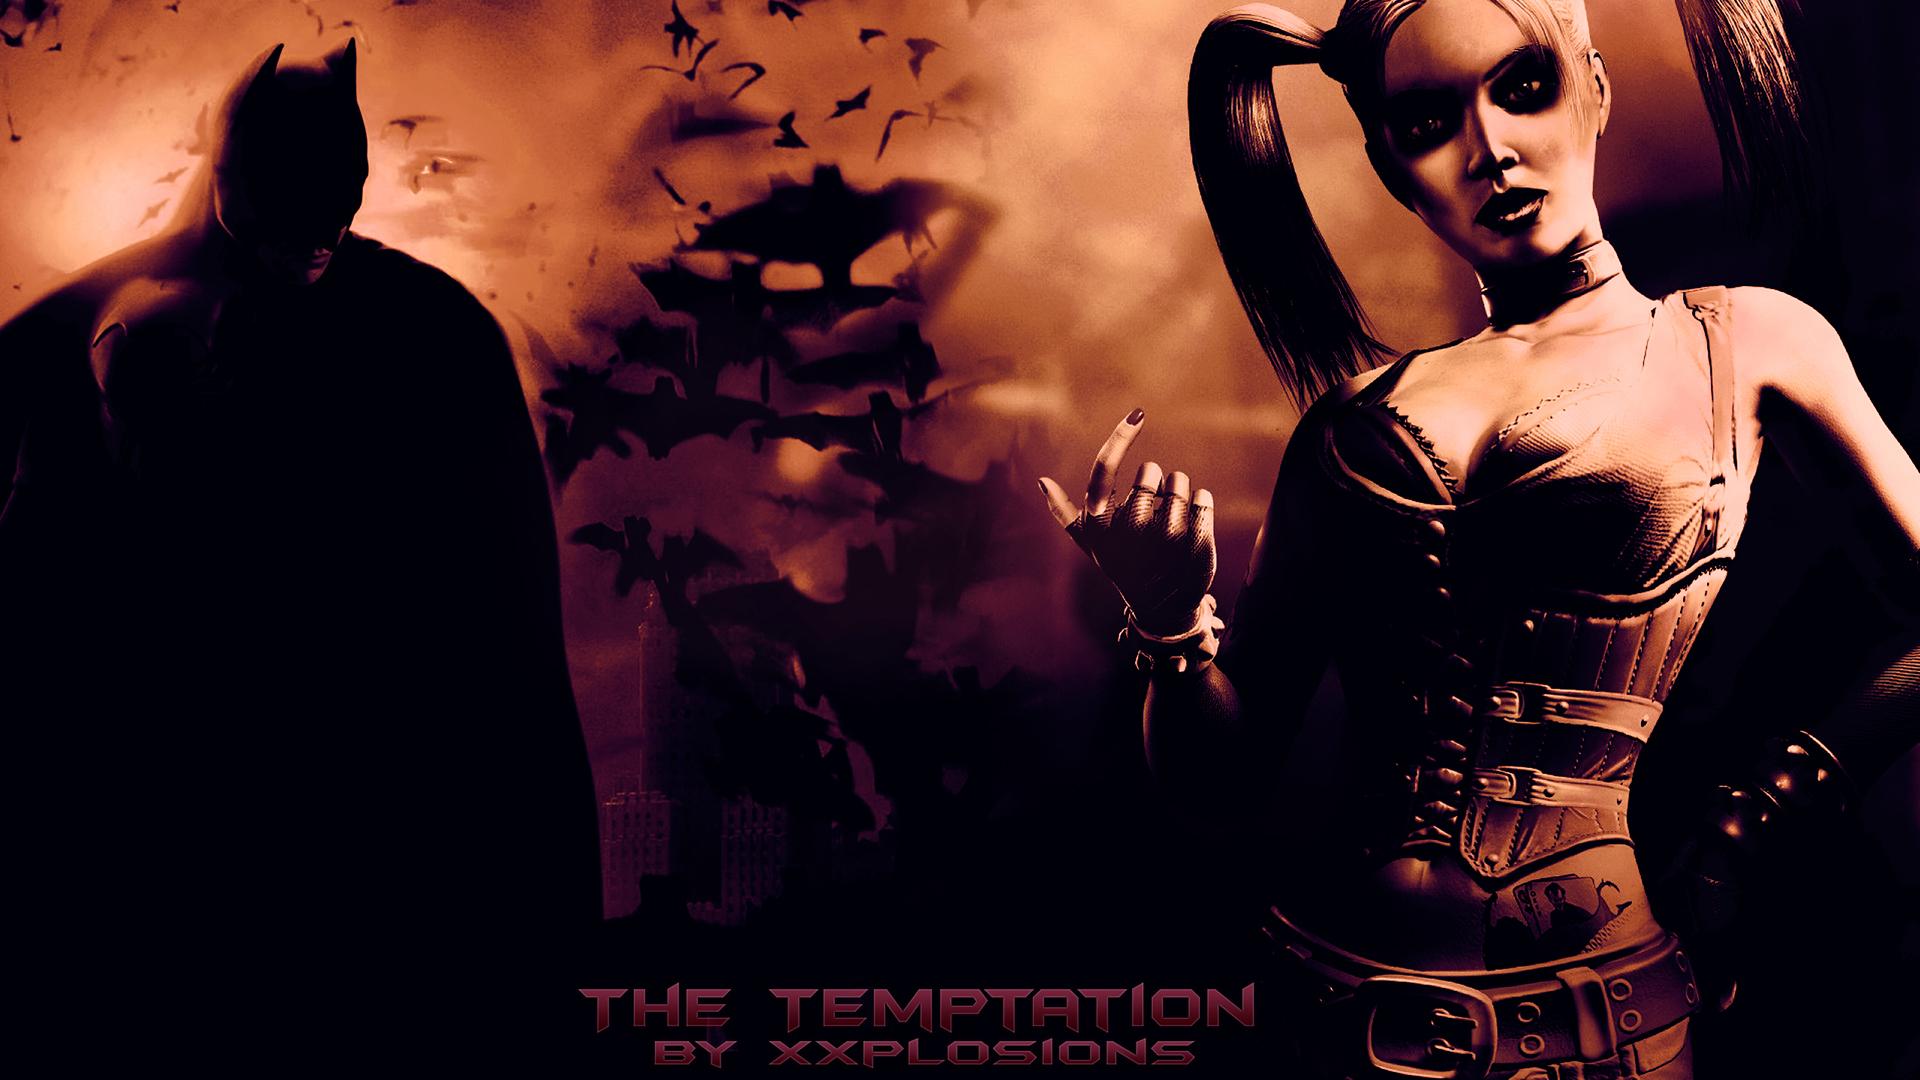 The Temptation   Batman Desktop Wallpaper by Xxplosions